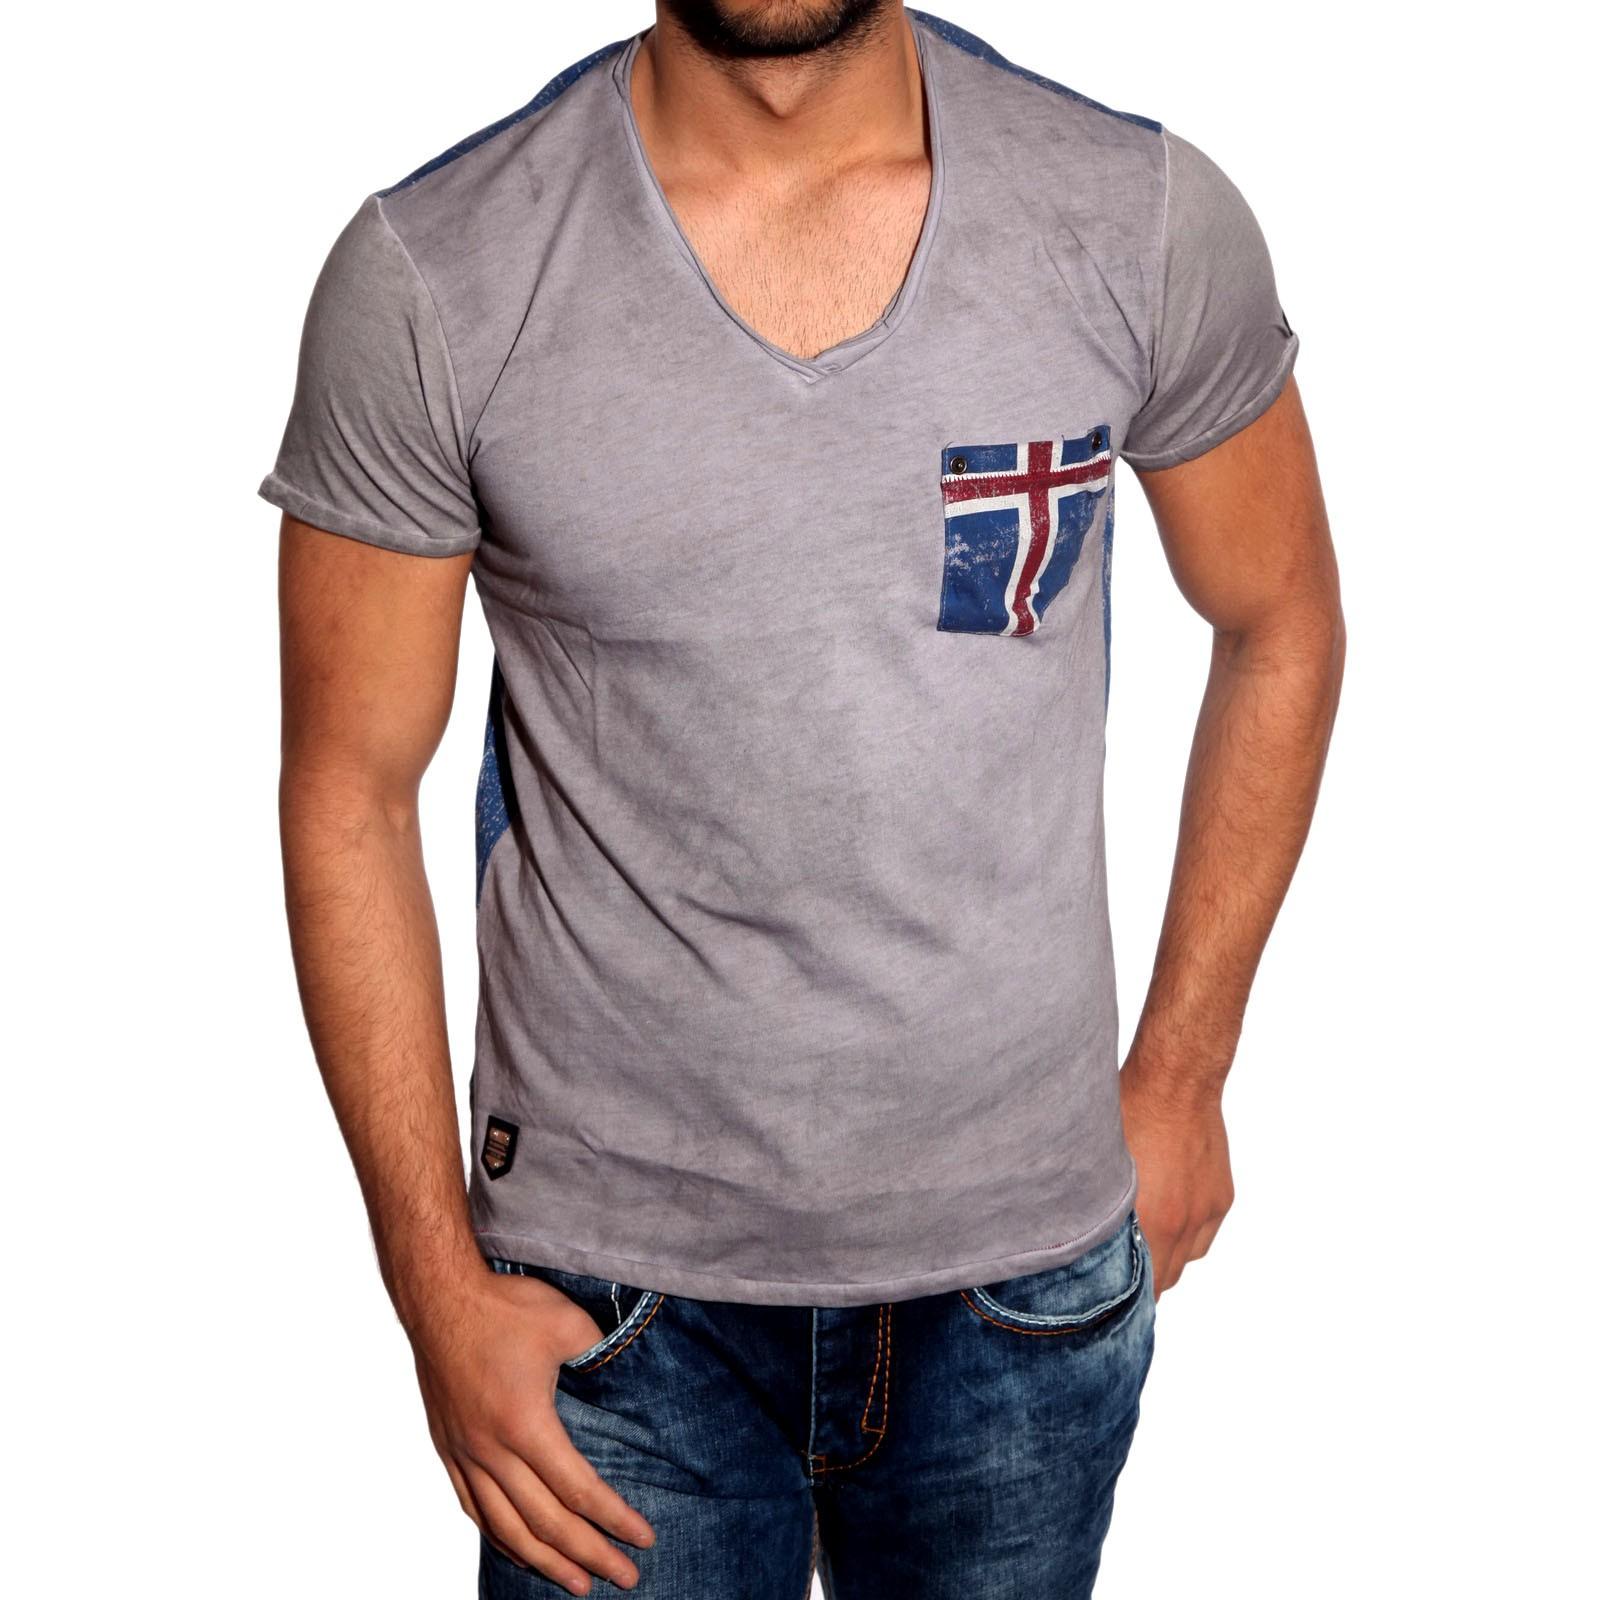 R-Neal T-Shirt 6641